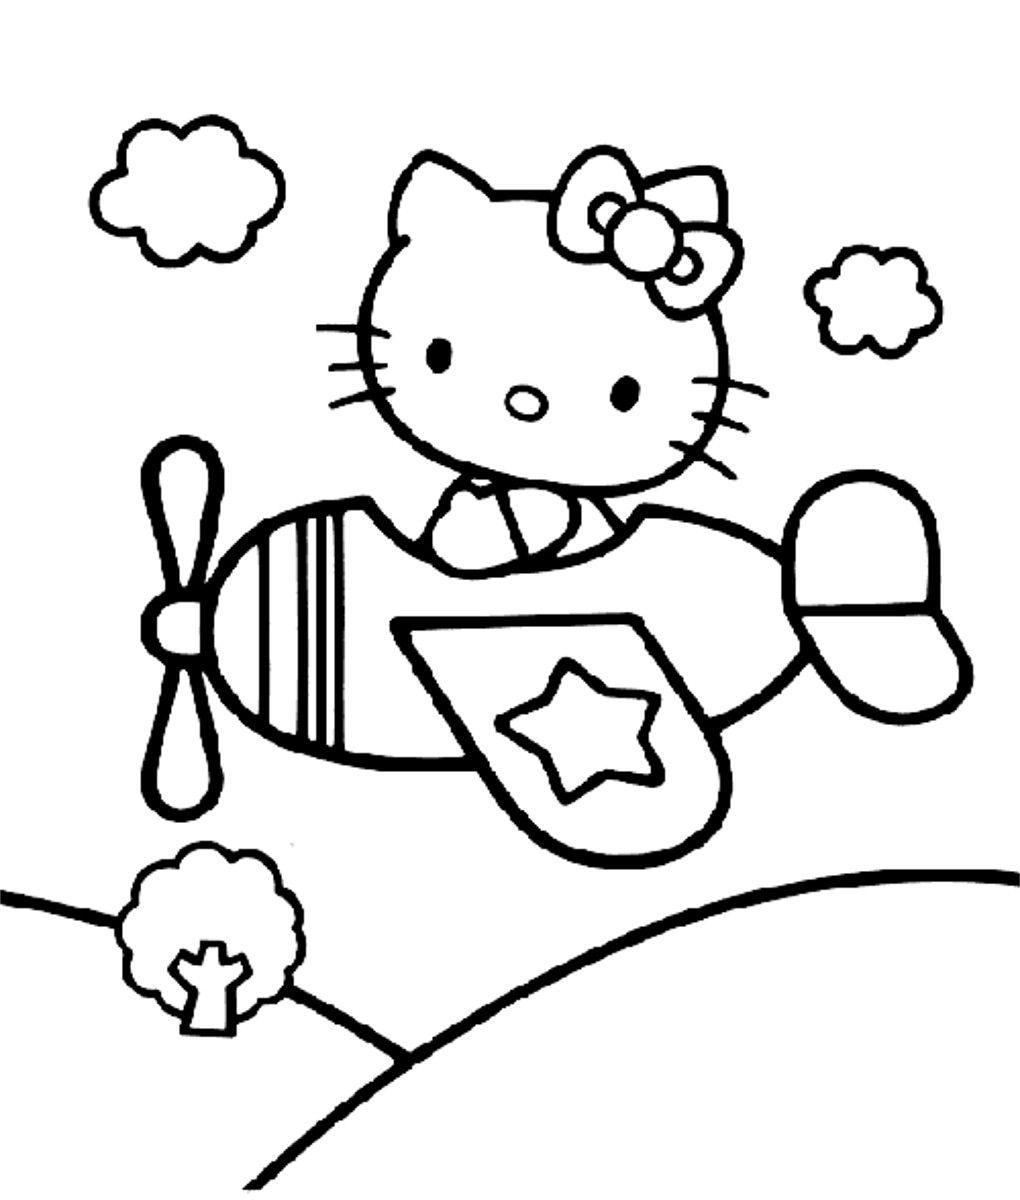 Colorear Online Bob Esponja Wuug Jpg 1020 1200 Hello Kitty Coloring Hello Kitty Colouring Pages Kitty Coloring